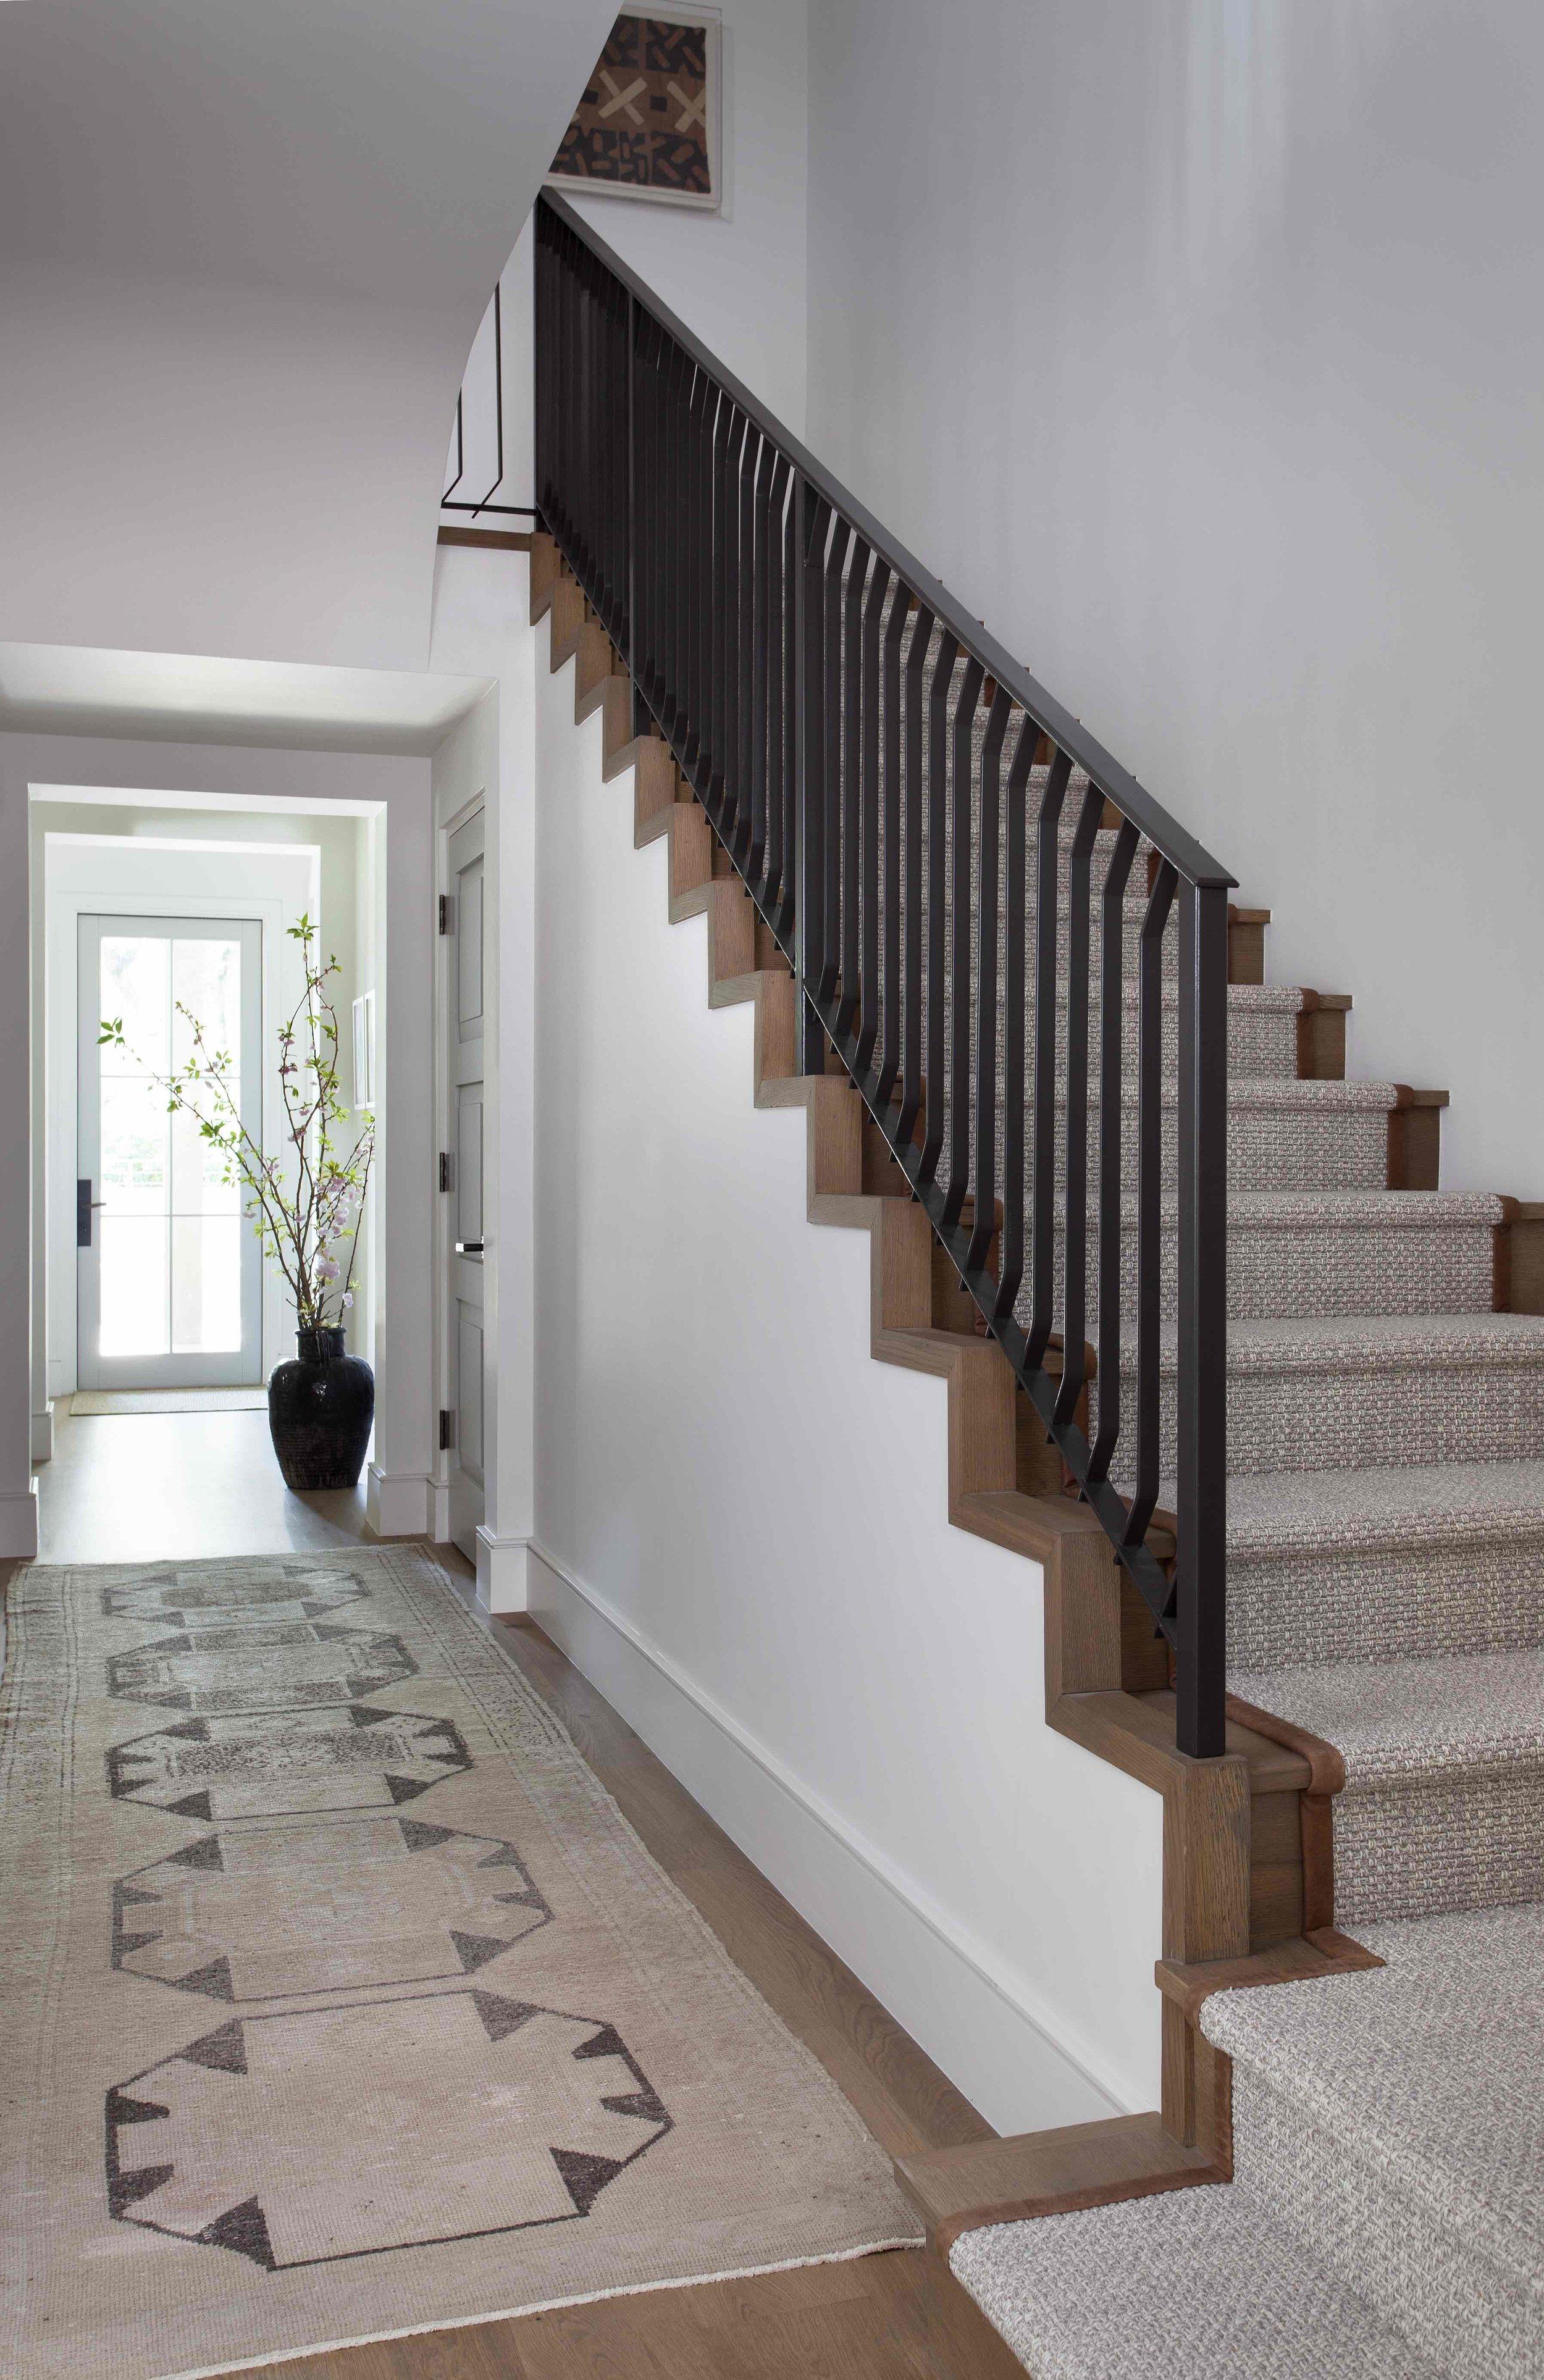 Stairwell copy low res.jpg